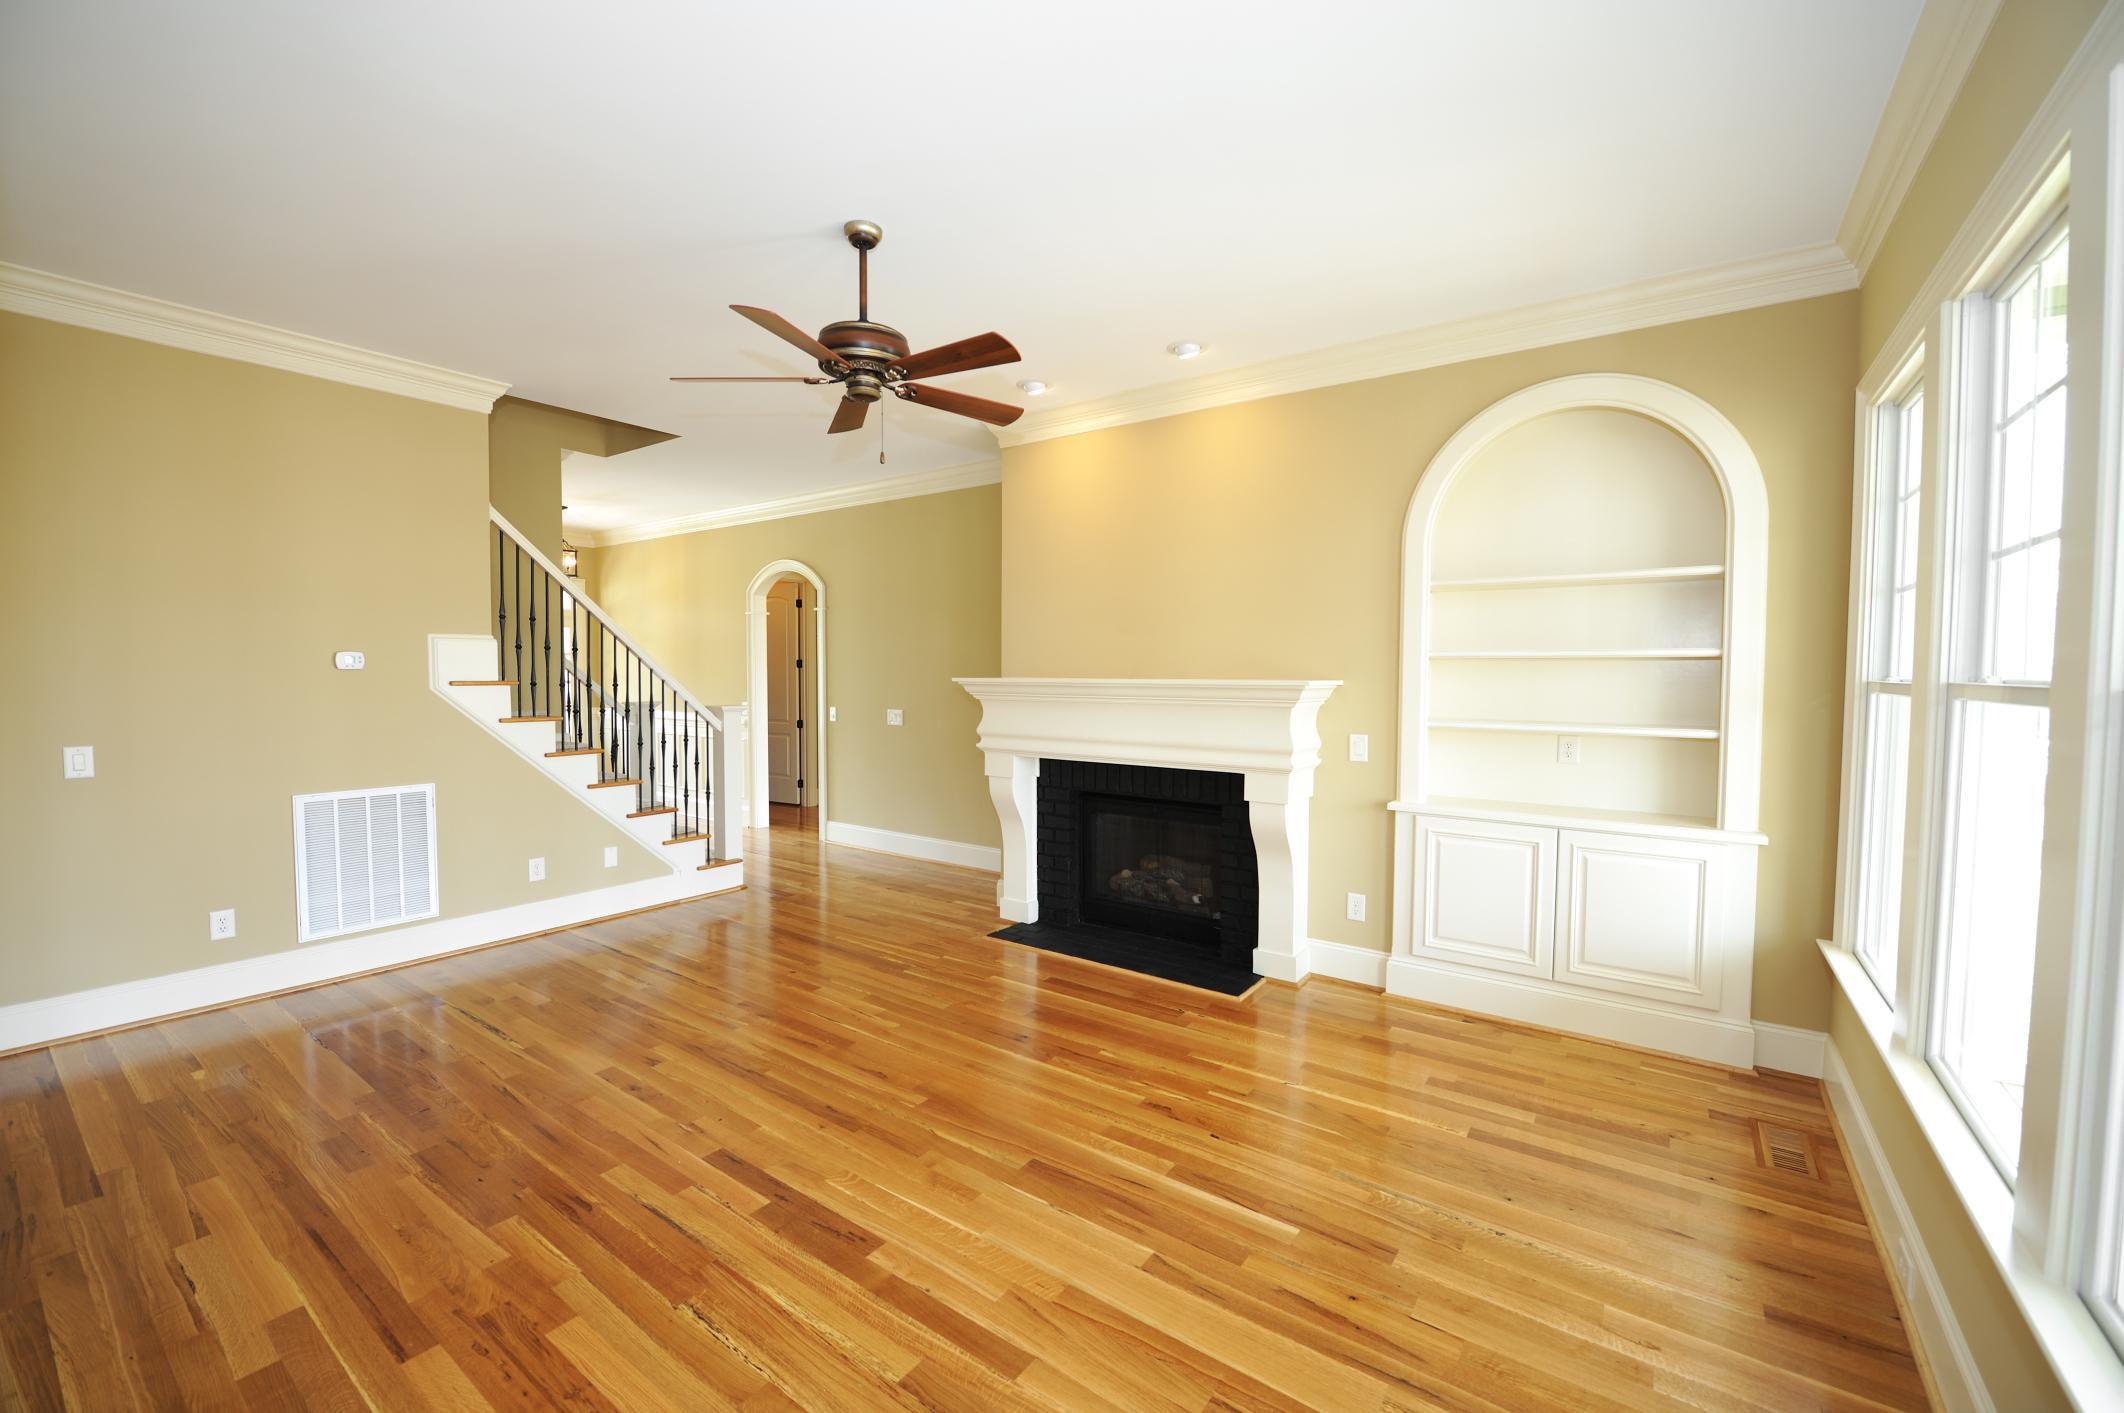 red oak engineered hardwood flooring of solid and engineered wood flooring in 56a4a2ac5f9b58b7d0d7ef49